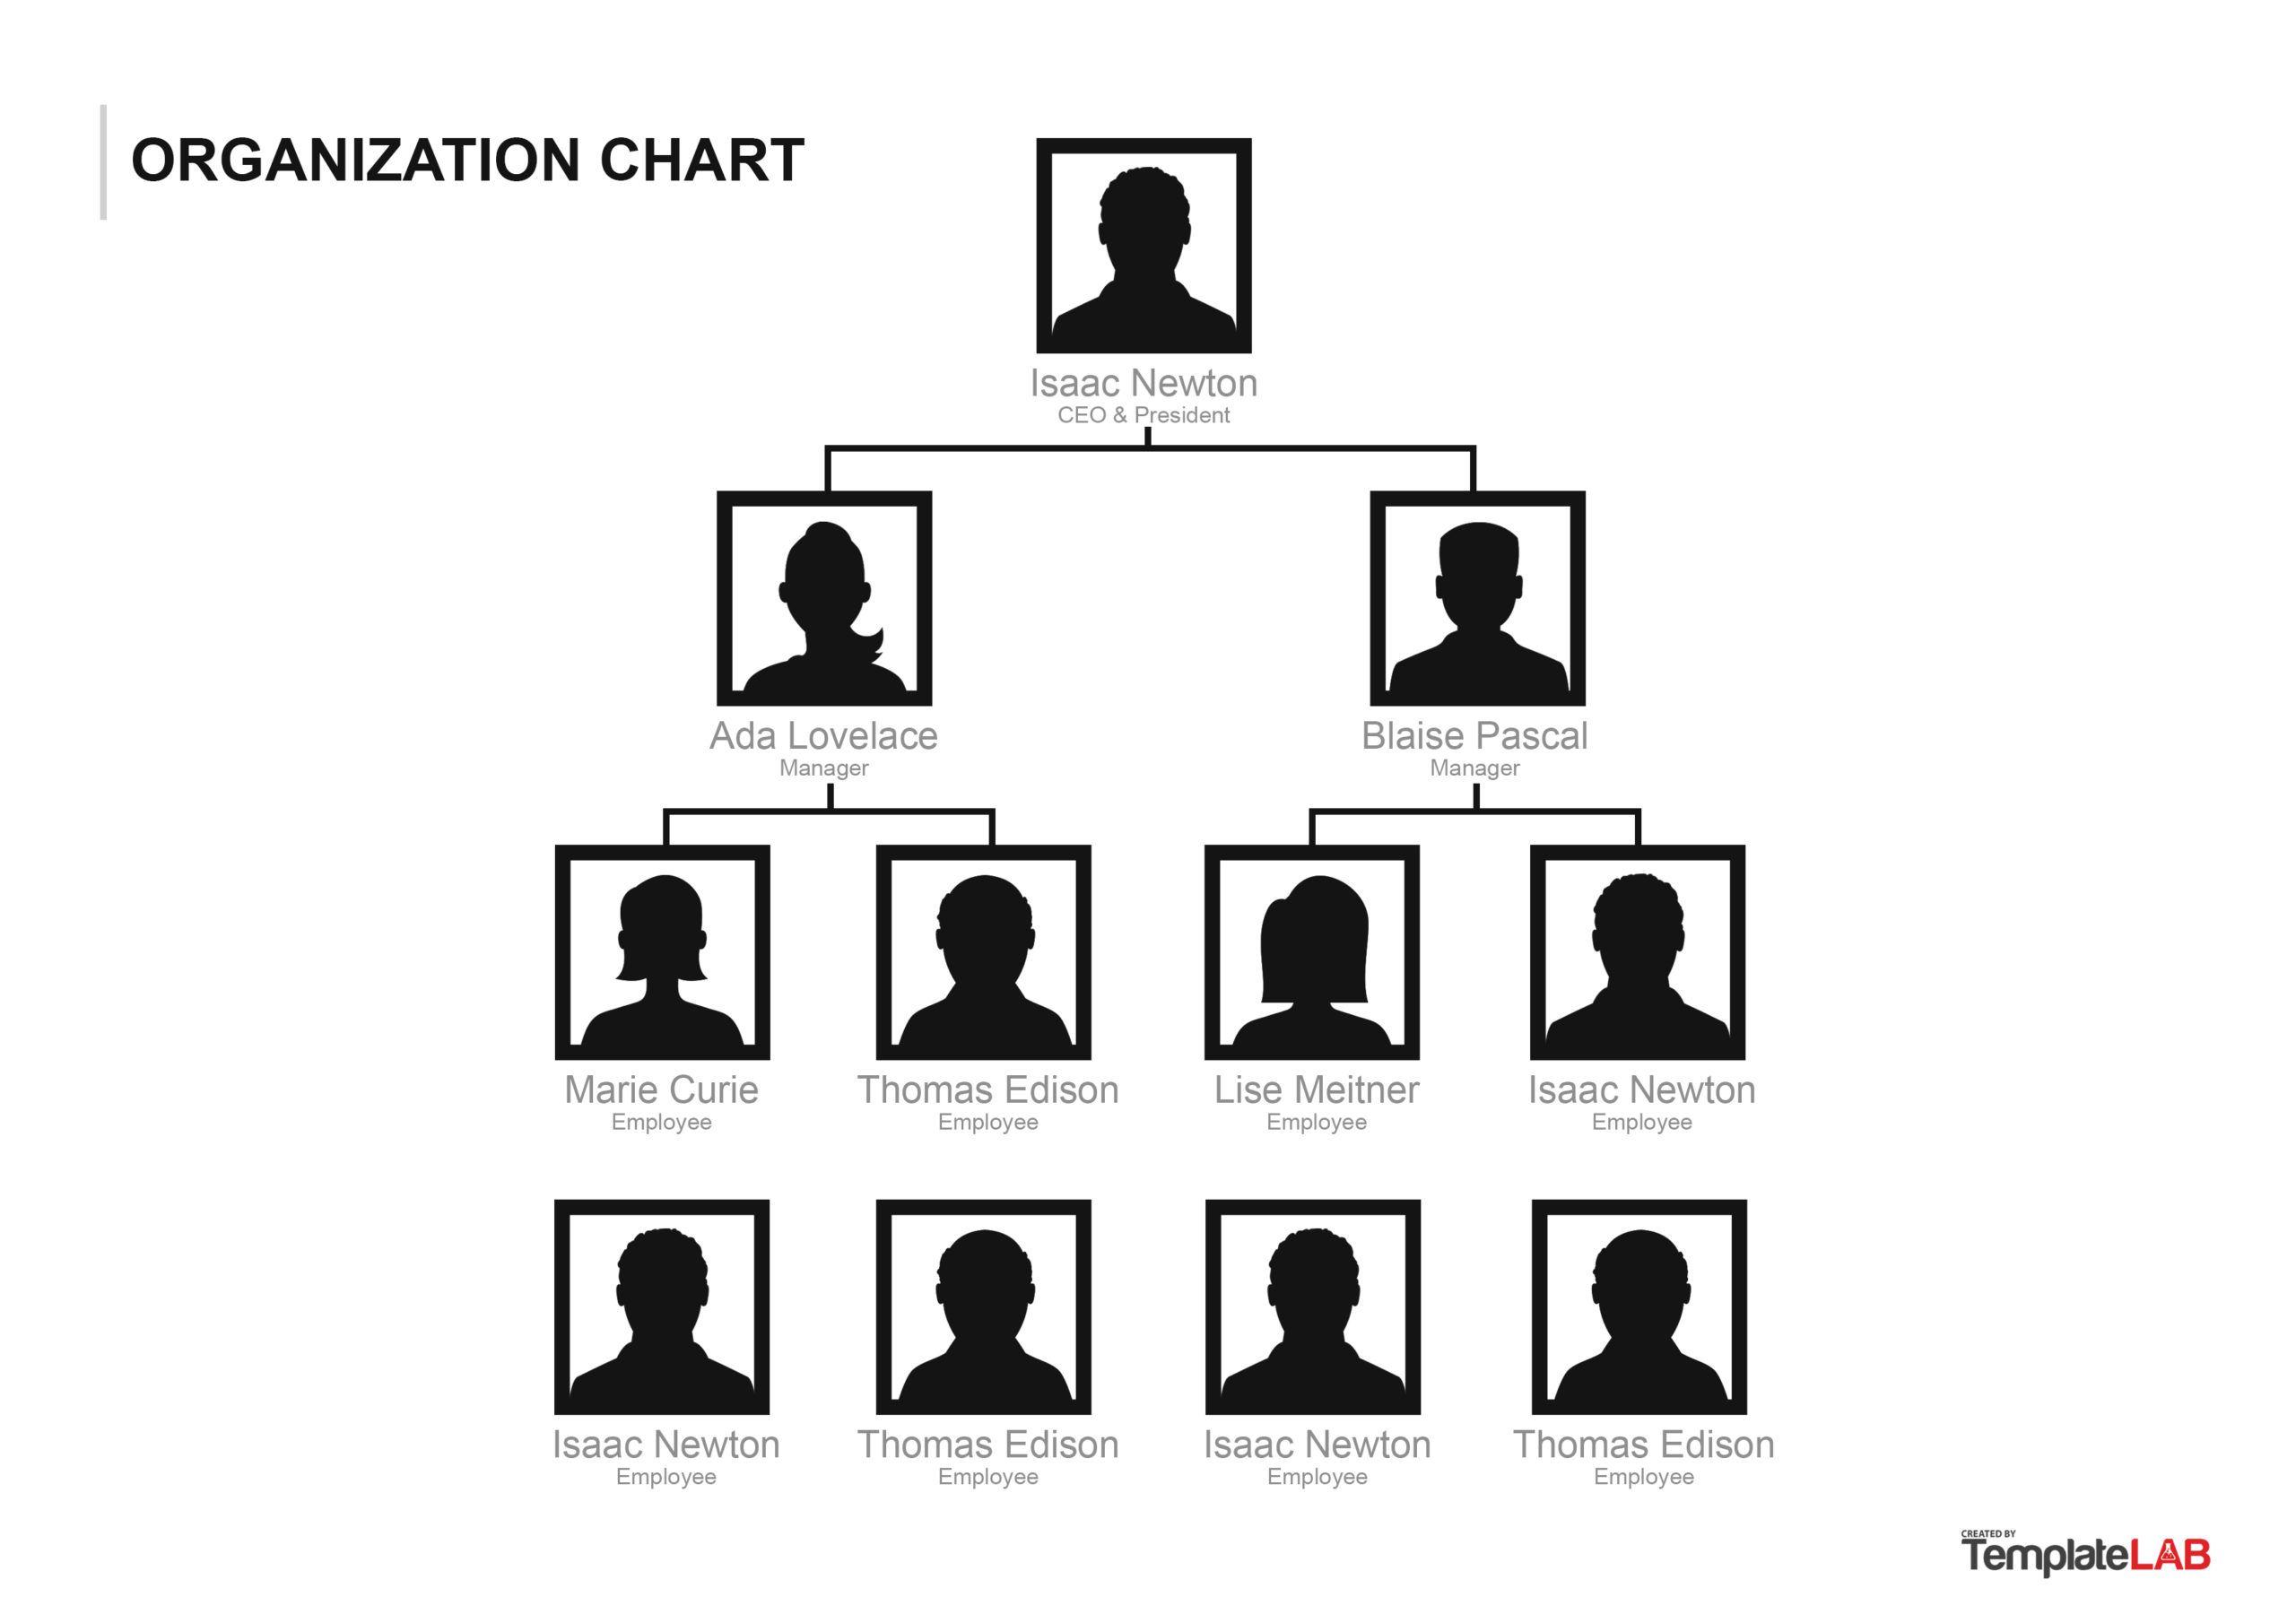 Org Chart Template Microsoft Word 2010 ~ Addictionary